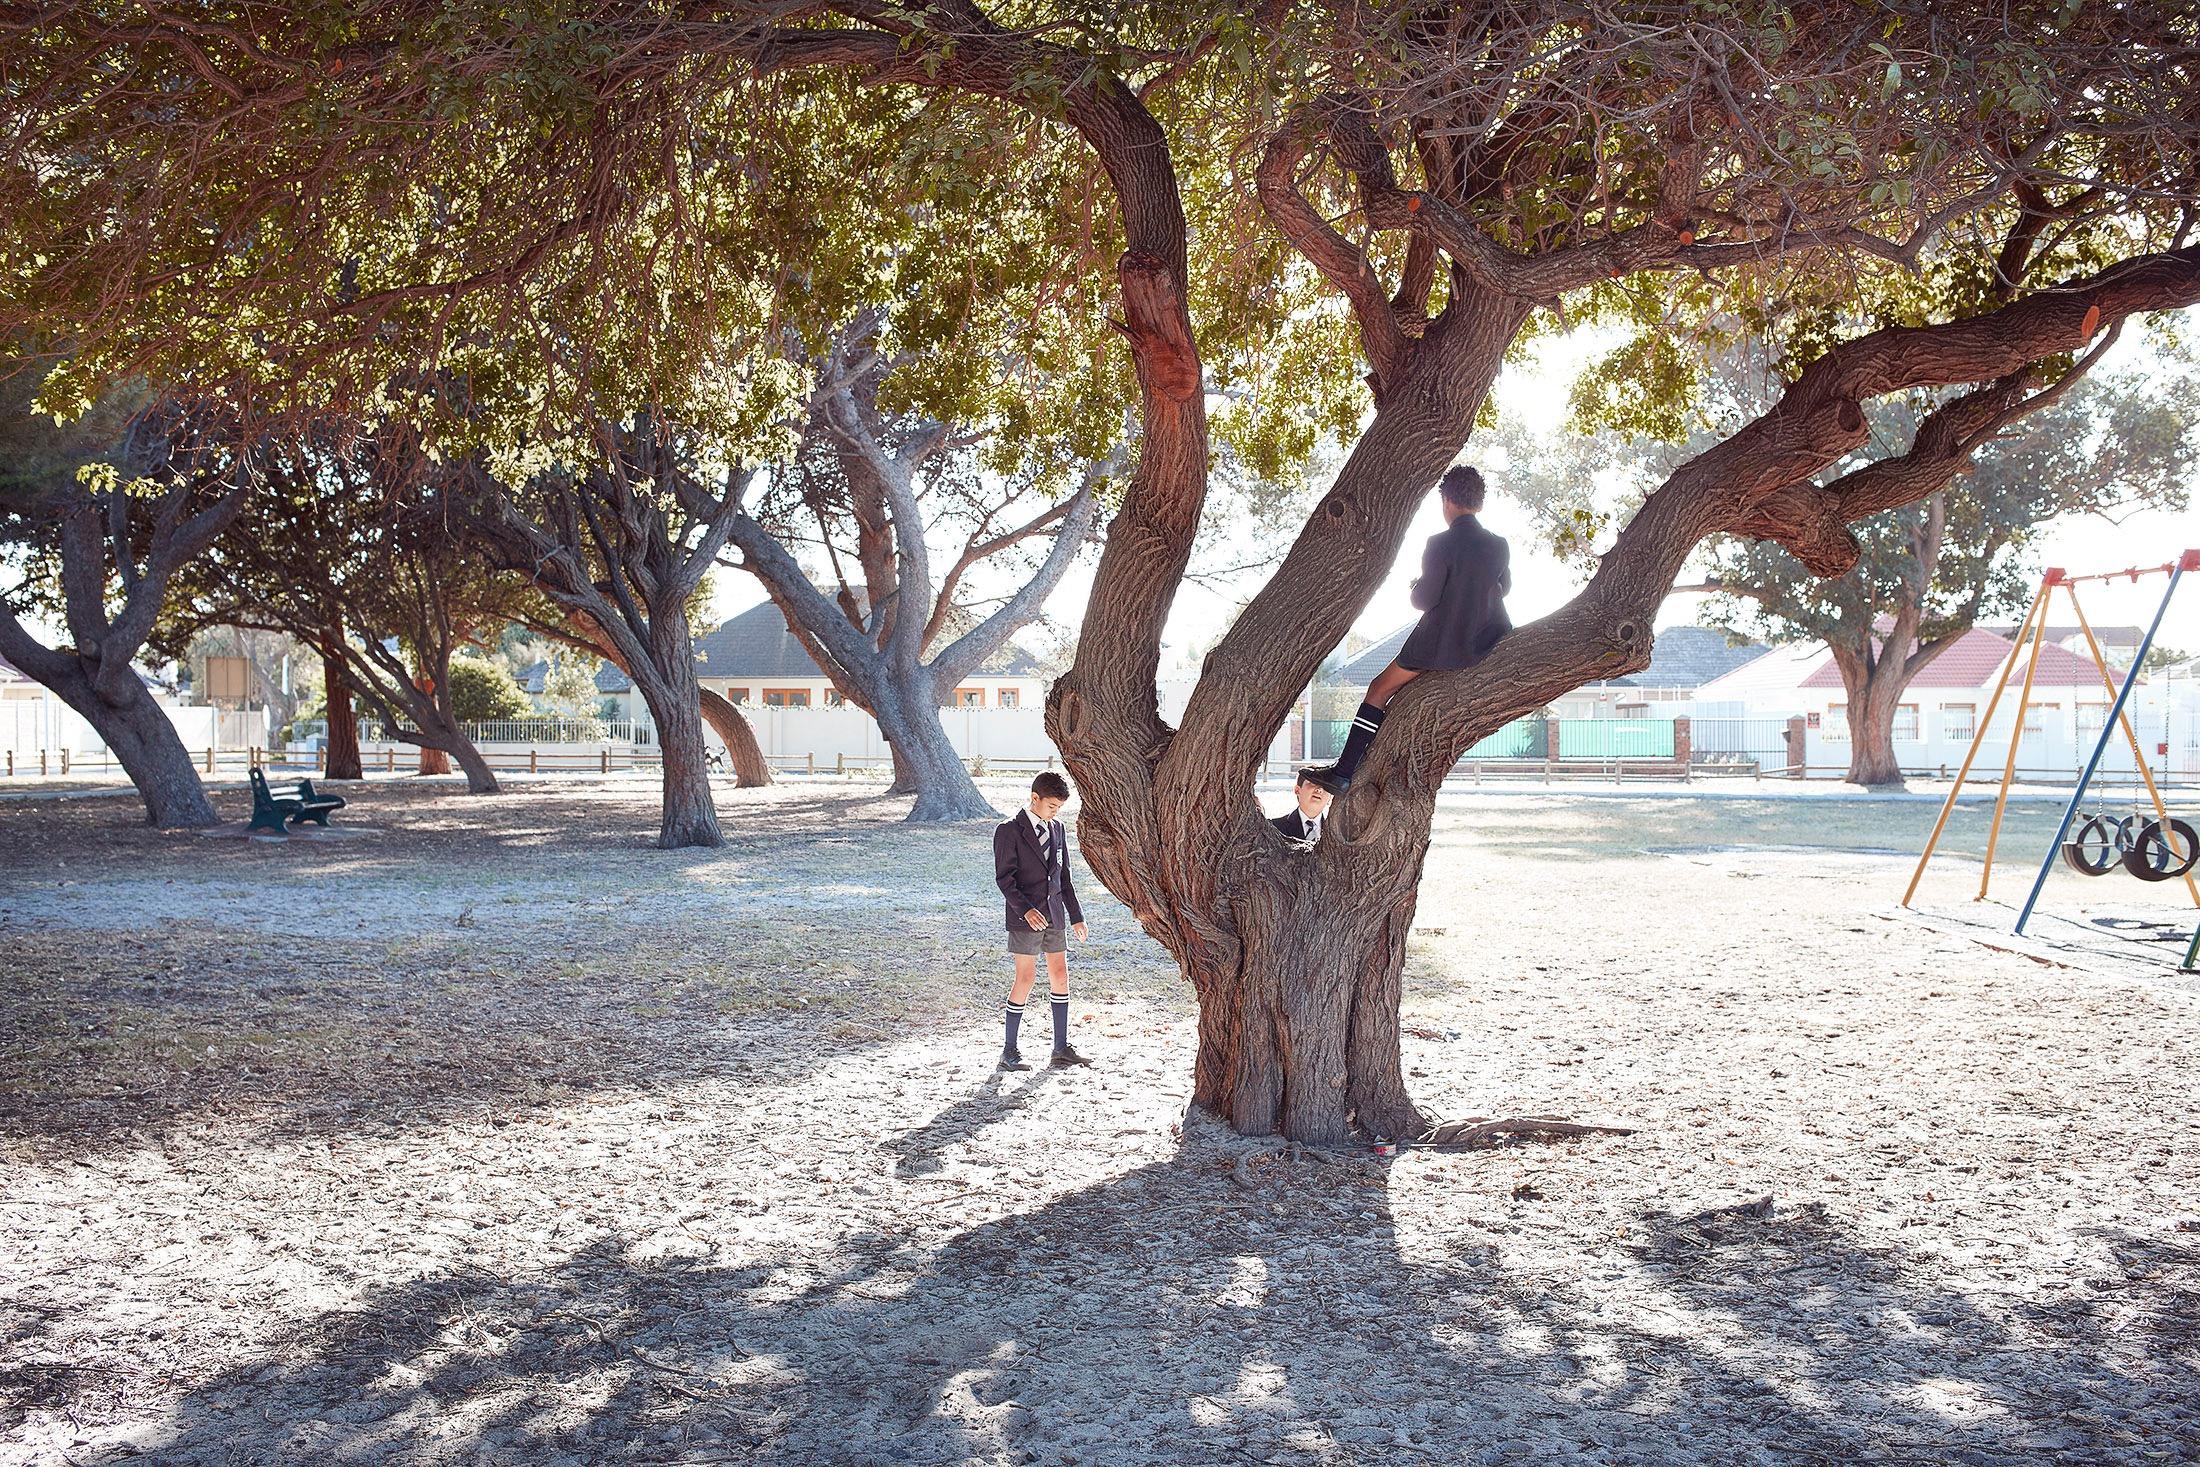 photo photography photographer school uniform education boy boys friends tree climb climbing playgound